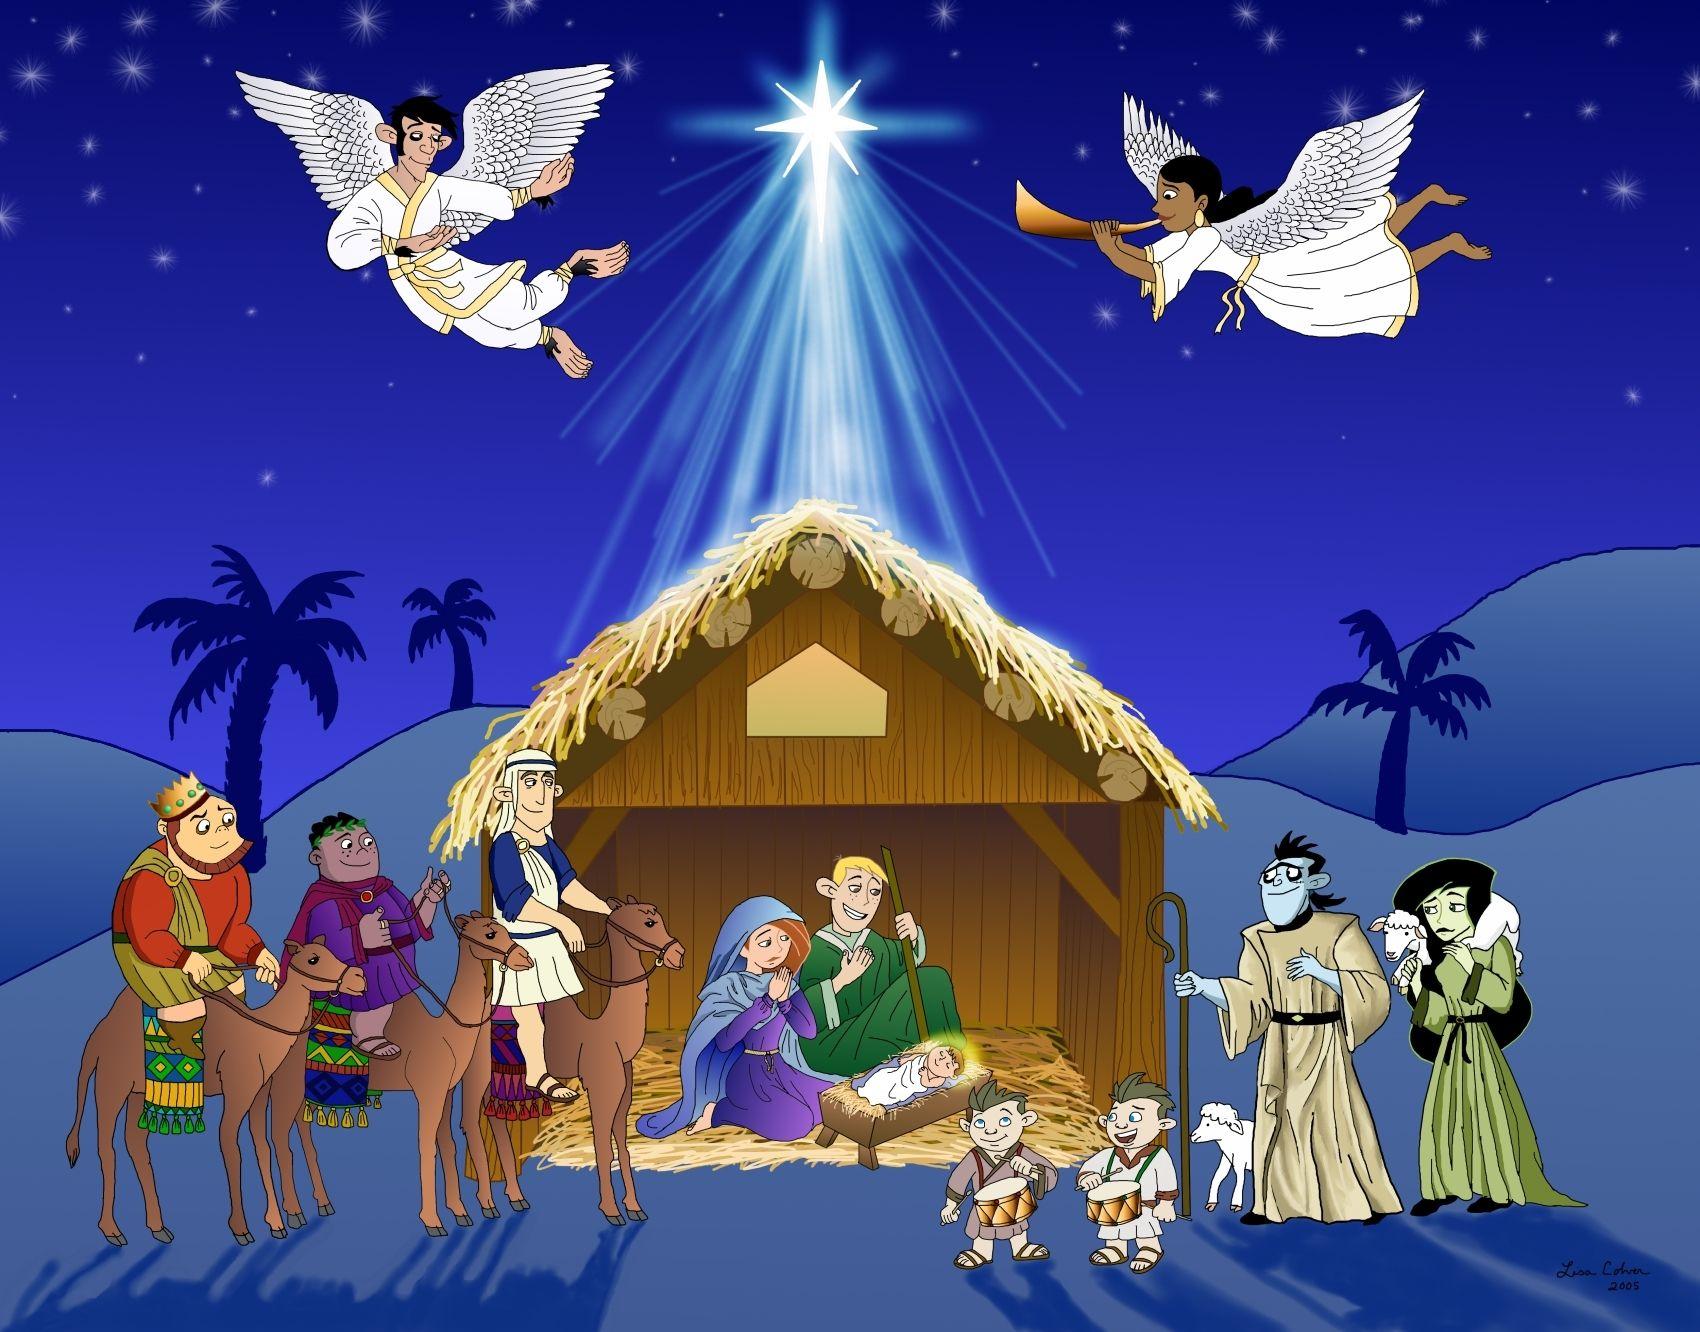 Nativity Scene Clip Art | kim possible nativity scene by drakkenfan ...